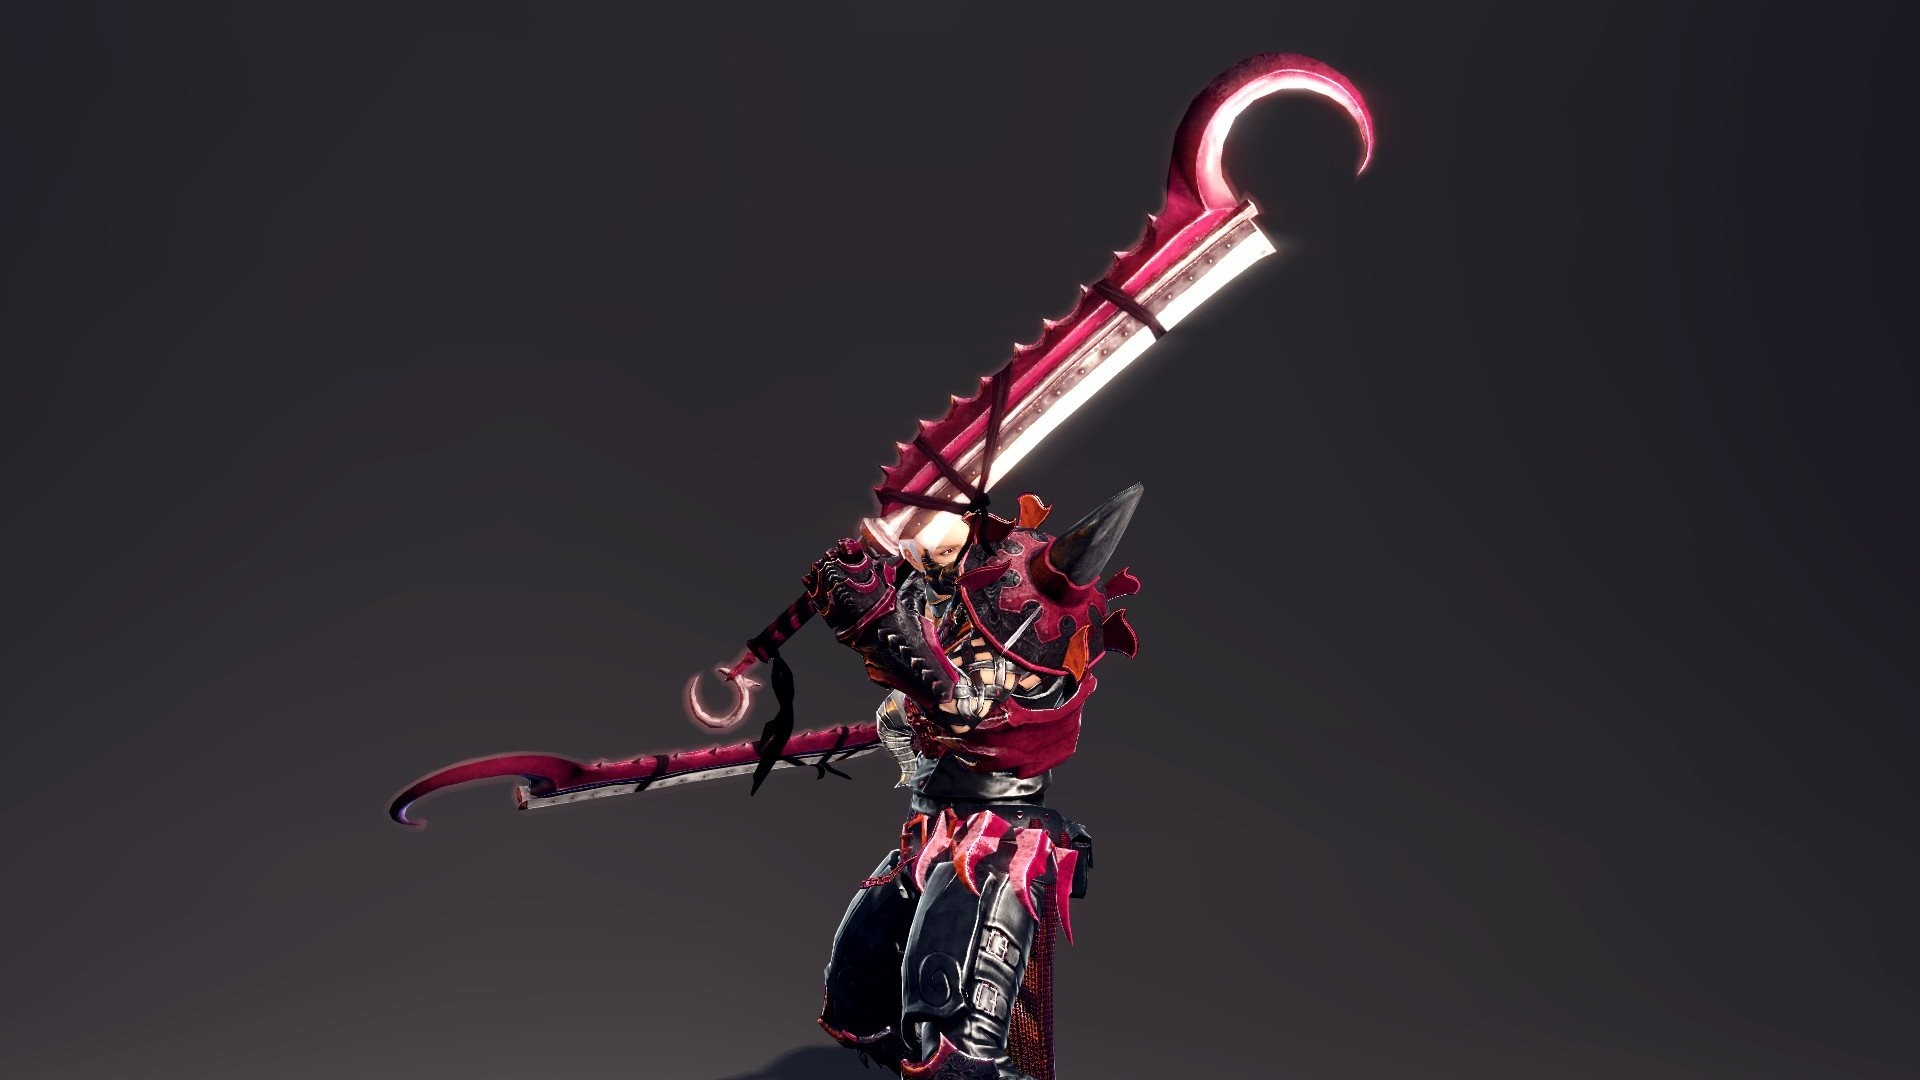 Raiders Twin Sword 1920x1080